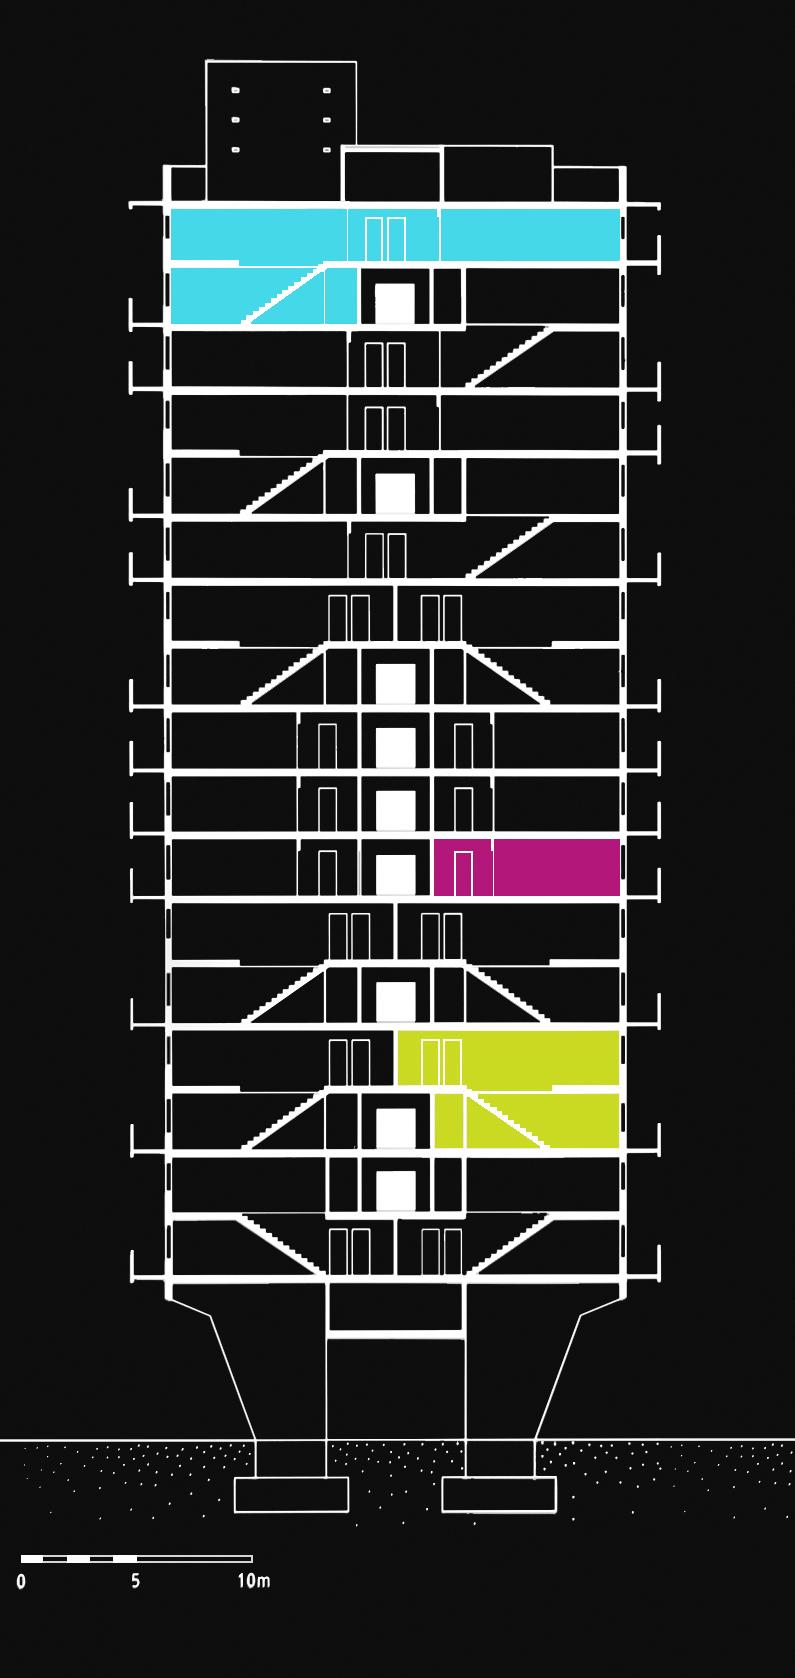 le corbusier unit d 39 habitation of berlin metalocus. Black Bedroom Furniture Sets. Home Design Ideas